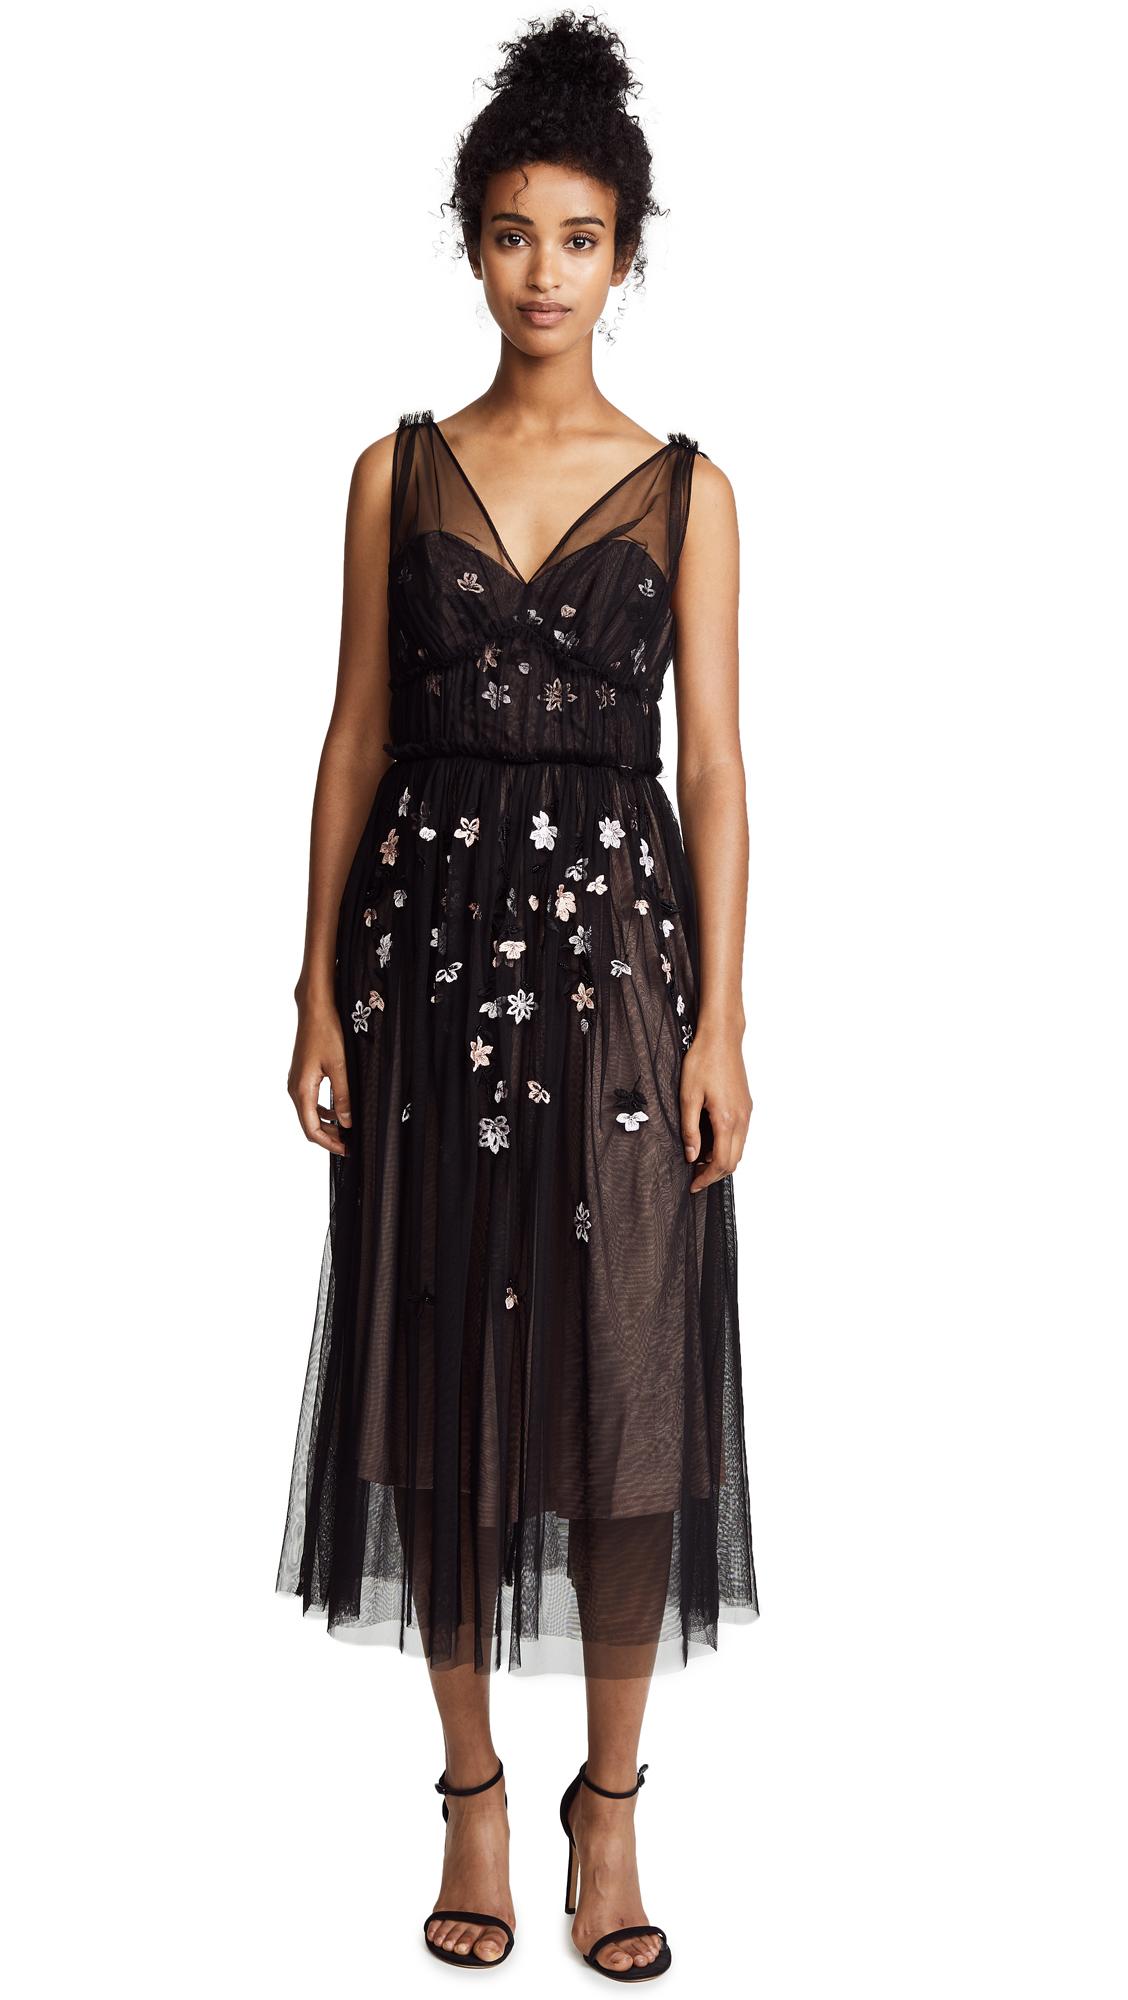 Parker Black Ruby Dress